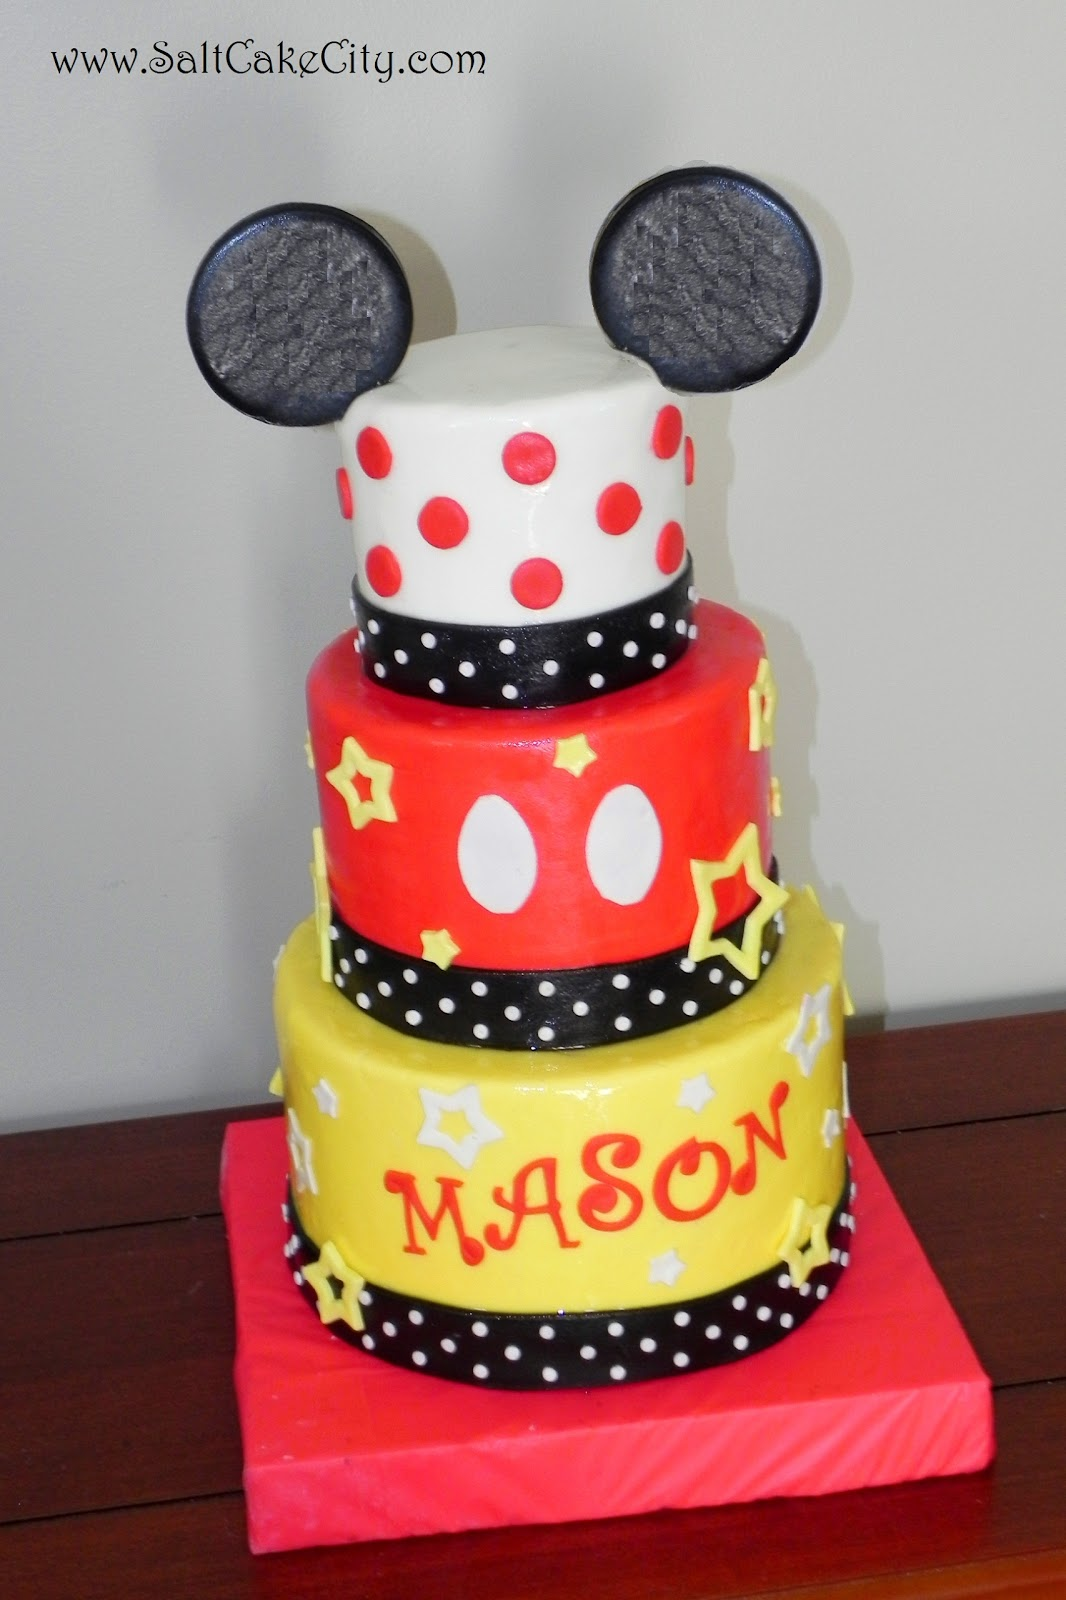 Salt Cake City 2 Mickey Mouse Birthday Cakes